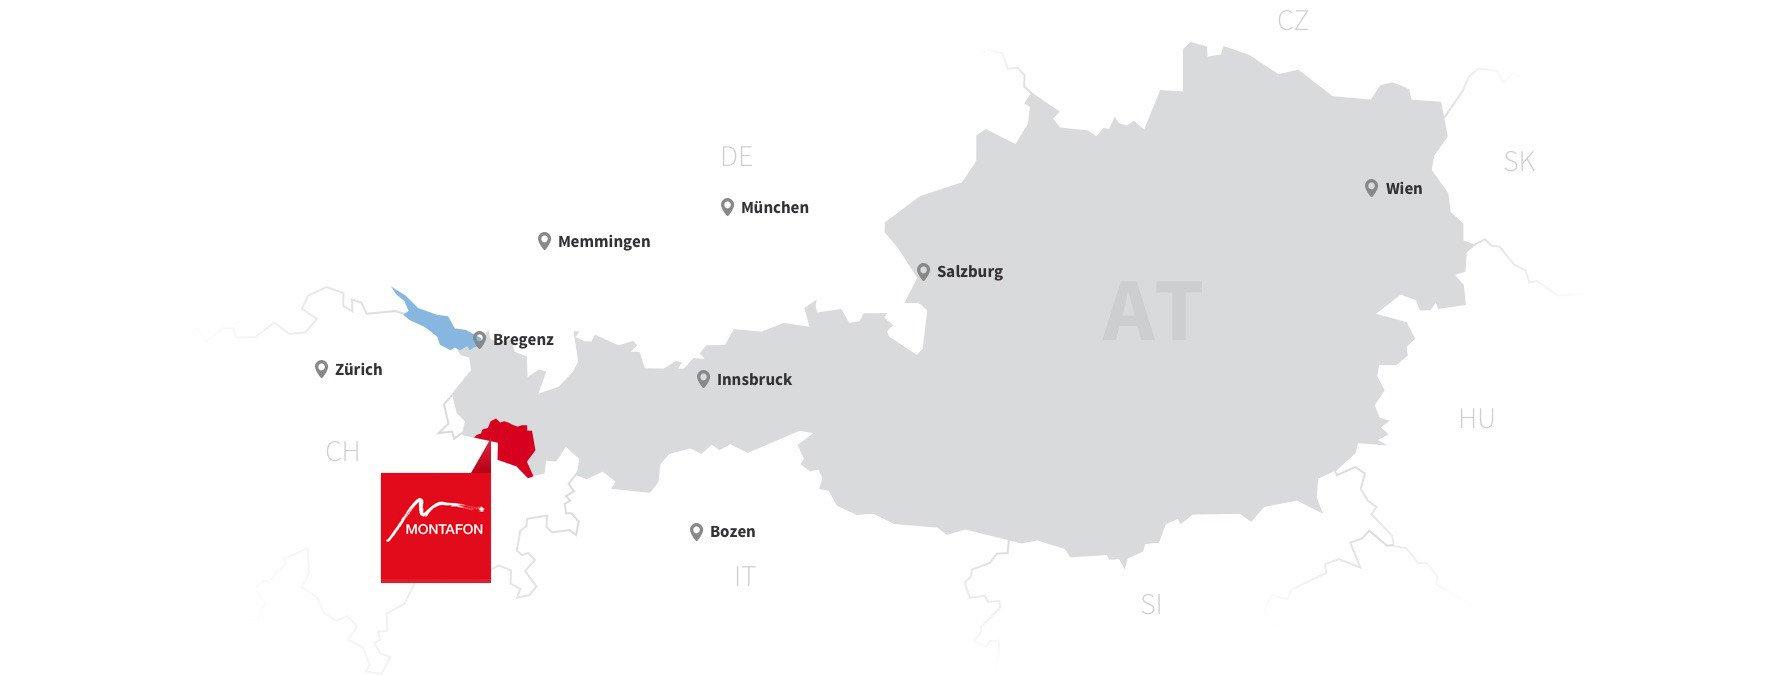 Getting To The Montafon Vorarlberg Montafon At